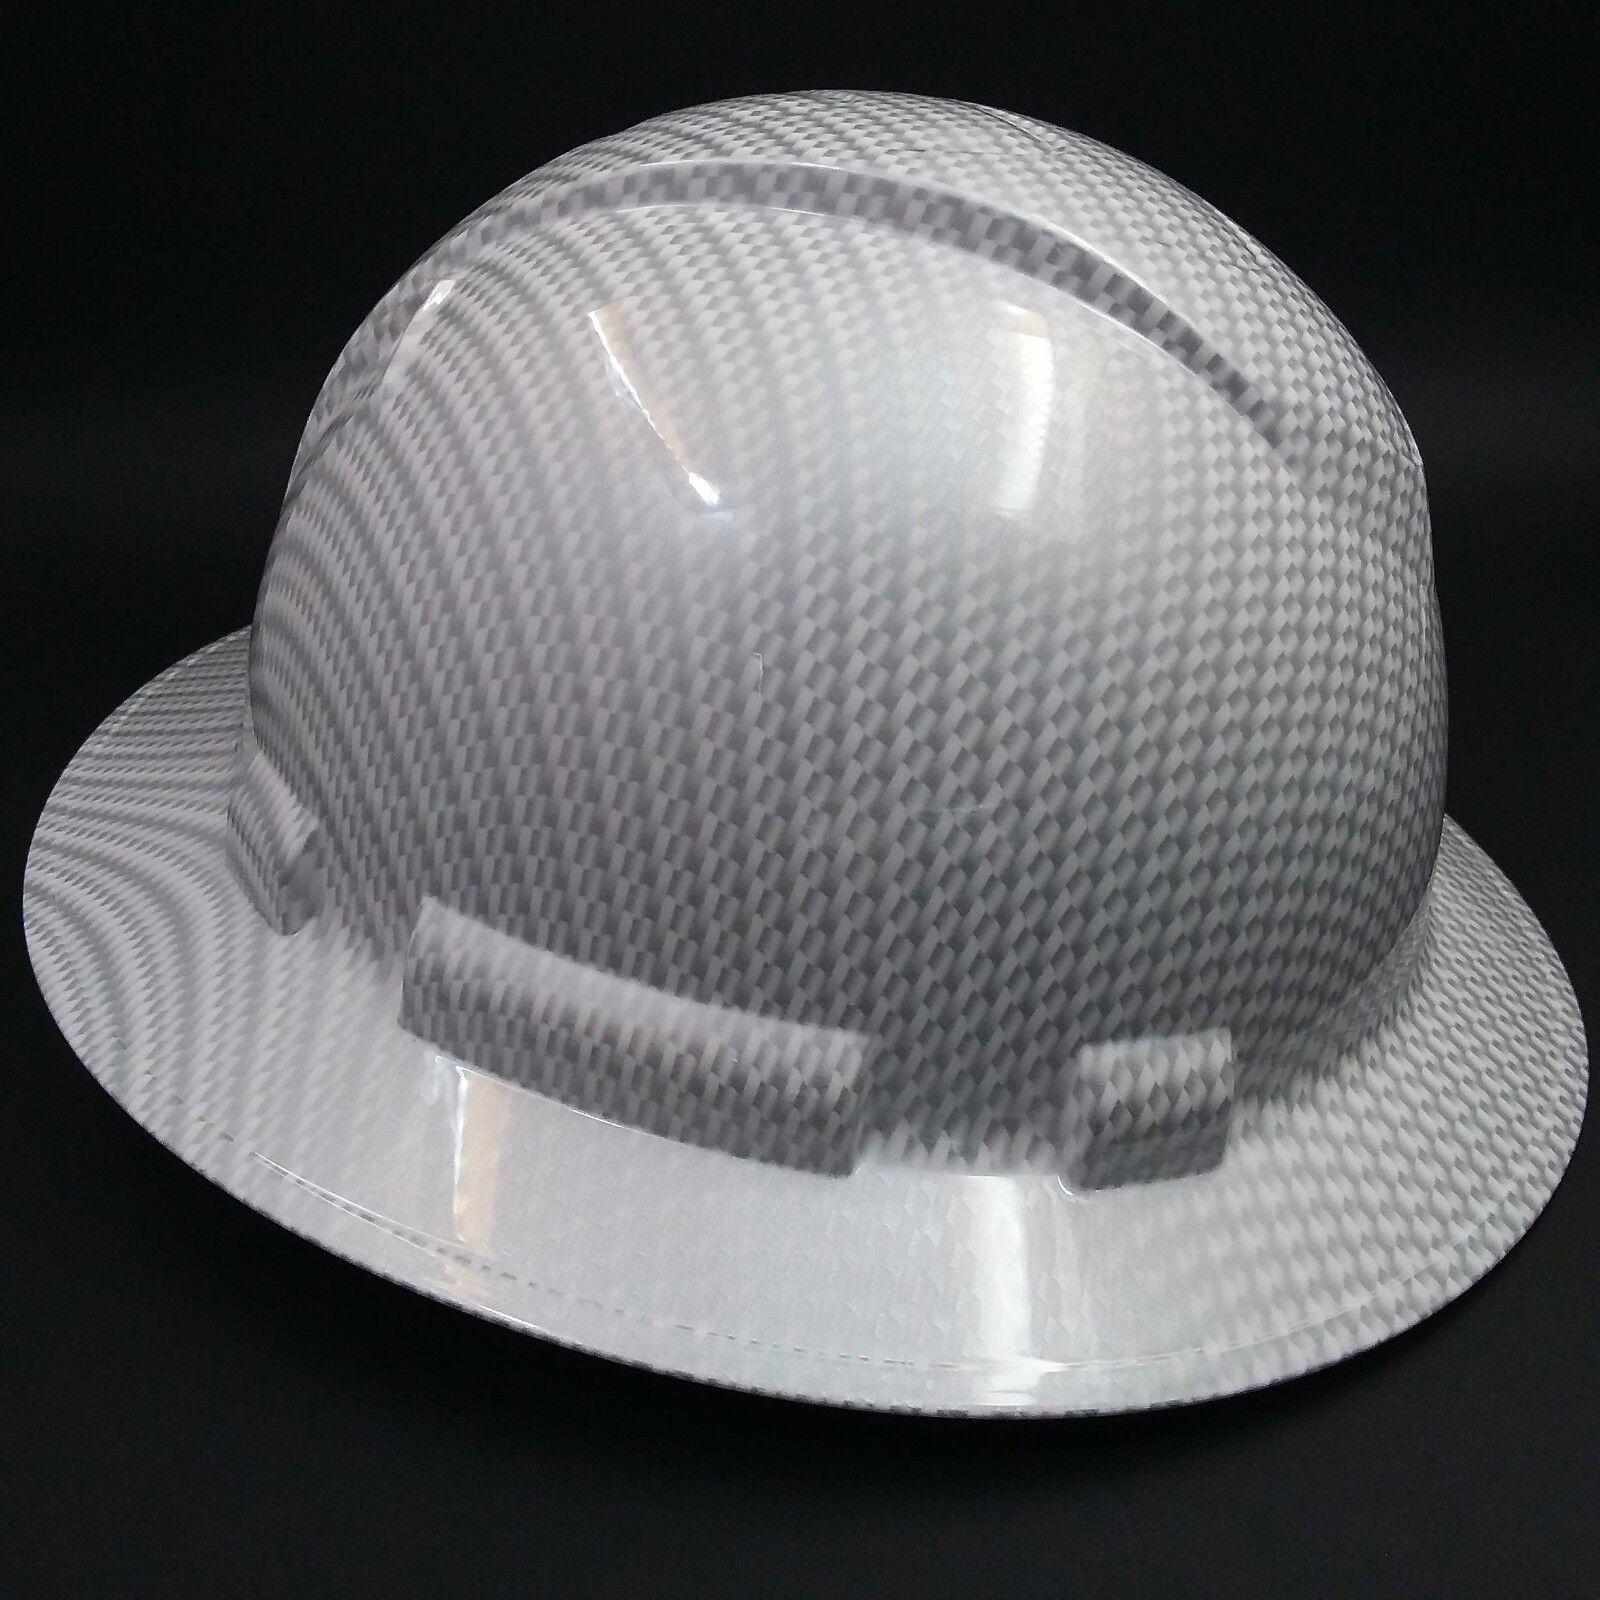 FULL BRIM Hard Hat custom hydro dipped , NEW WHITE CARBON FIBER HOT NEW HYDRO 2